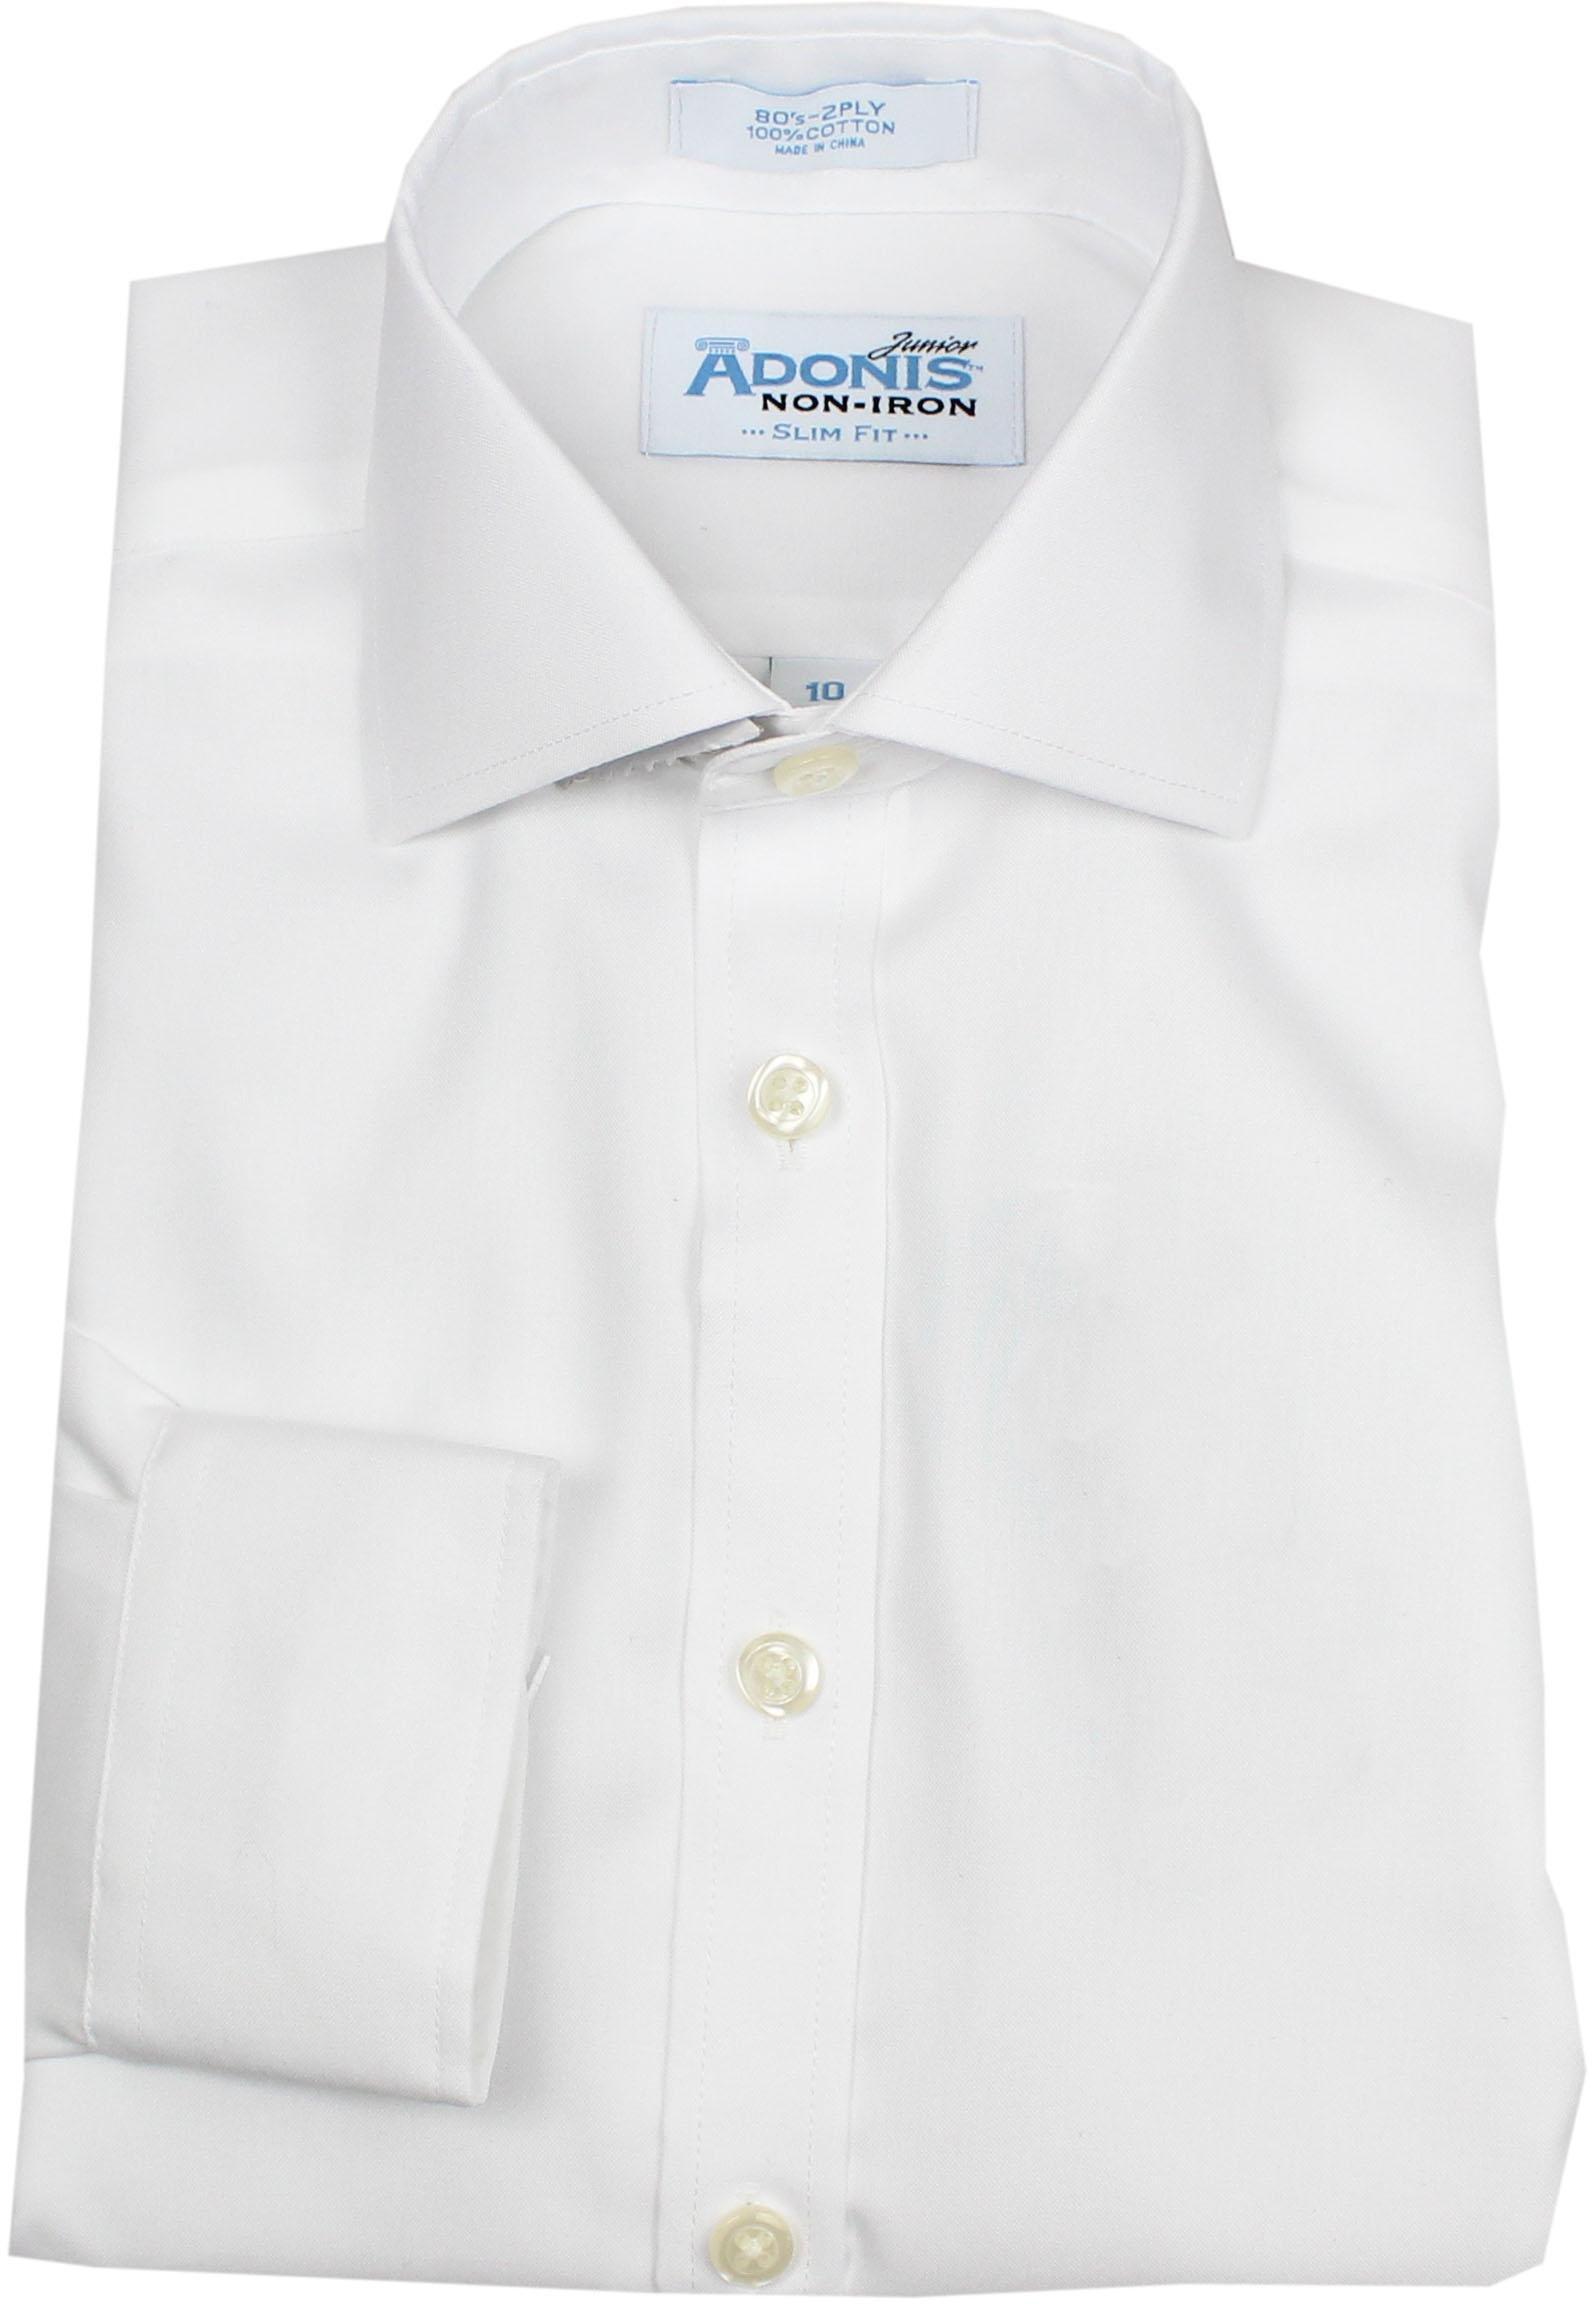 ADONIS Boys 100% Cotton Non Iron White Solid Pinpoint Long Sleeve Dress Shirt - White, 12 Slim